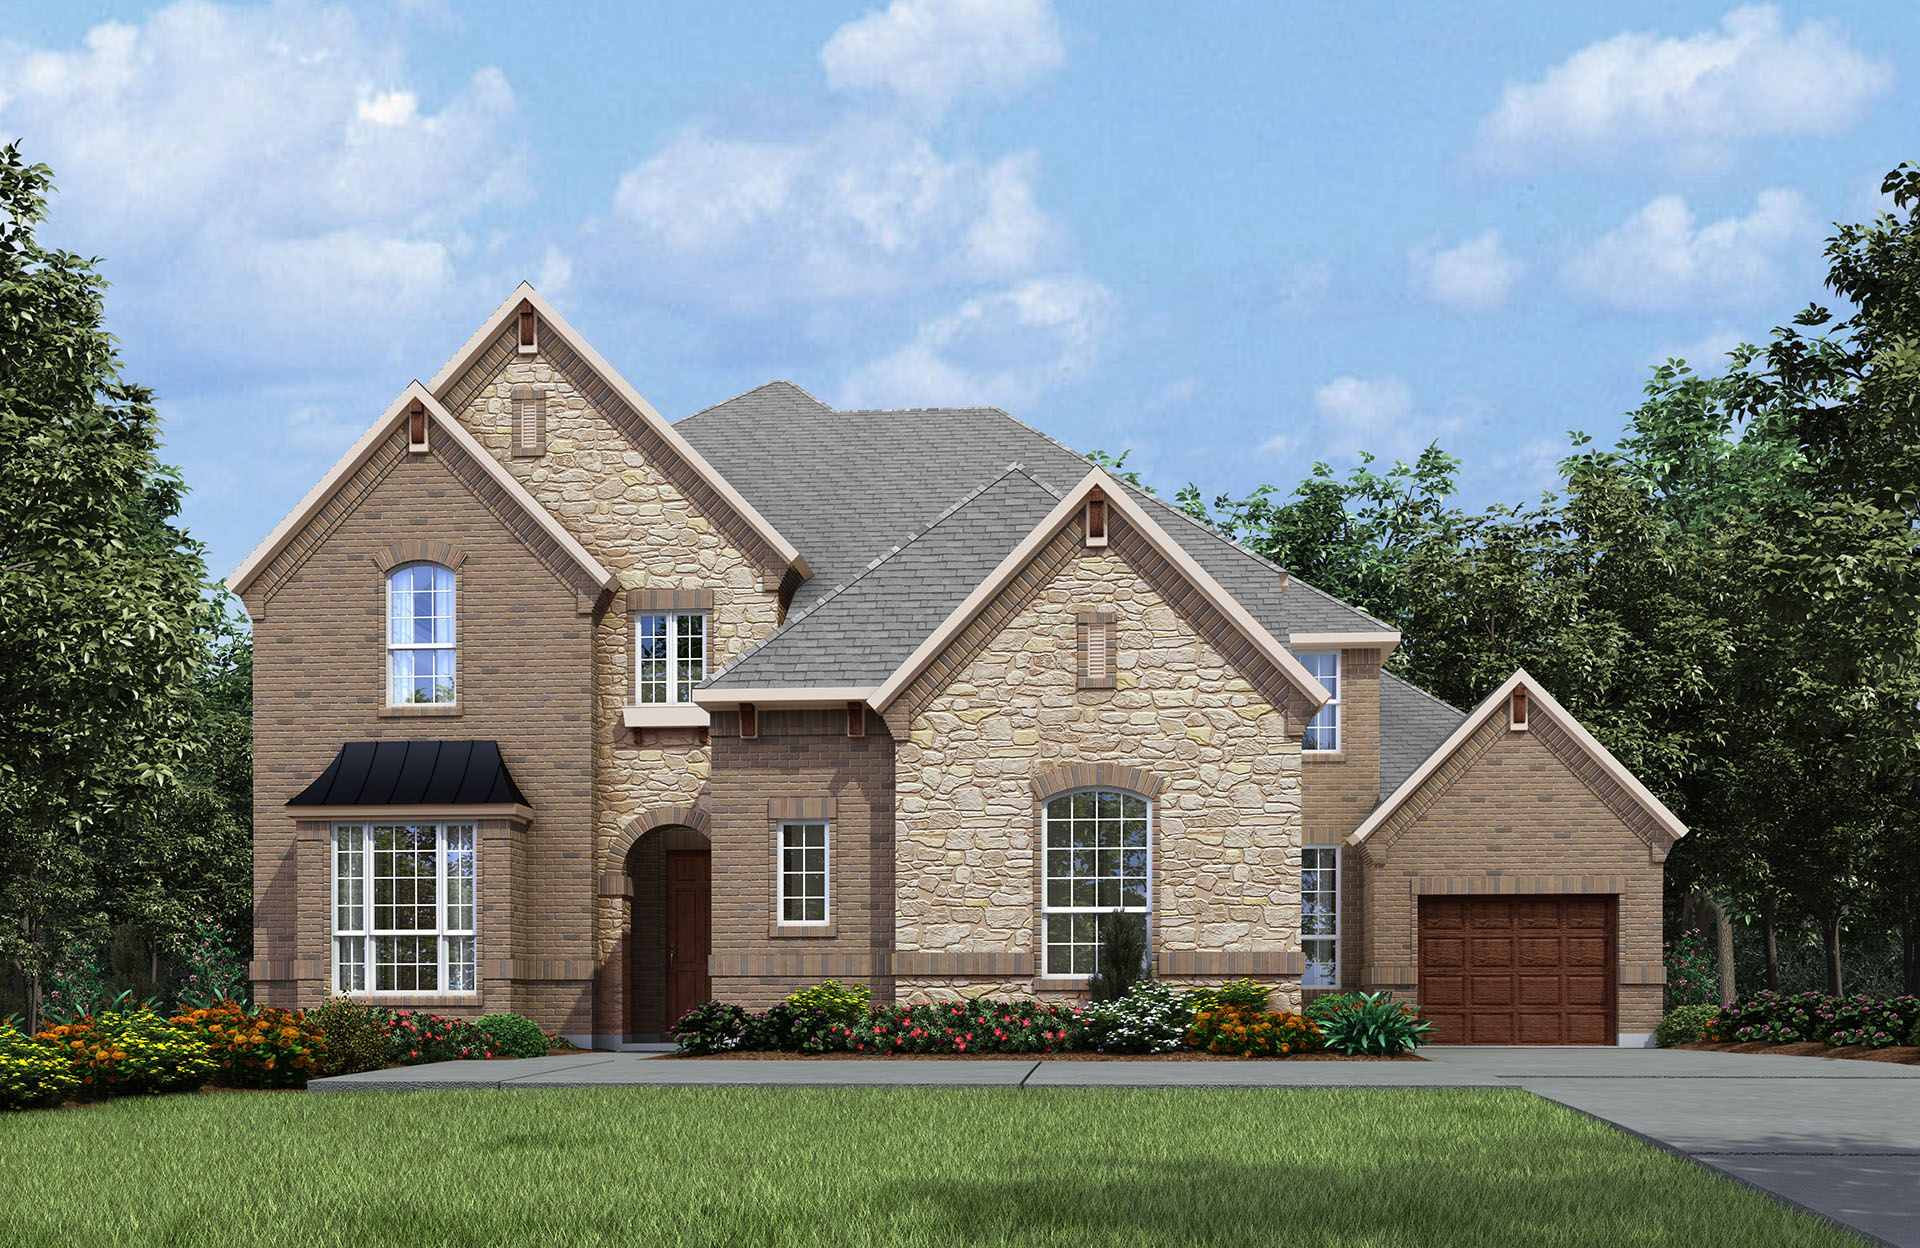 Single Family for Sale at Viridian - Oakley Ii 1344 Viridian Park Lane Arlington, Texas 76005 United States